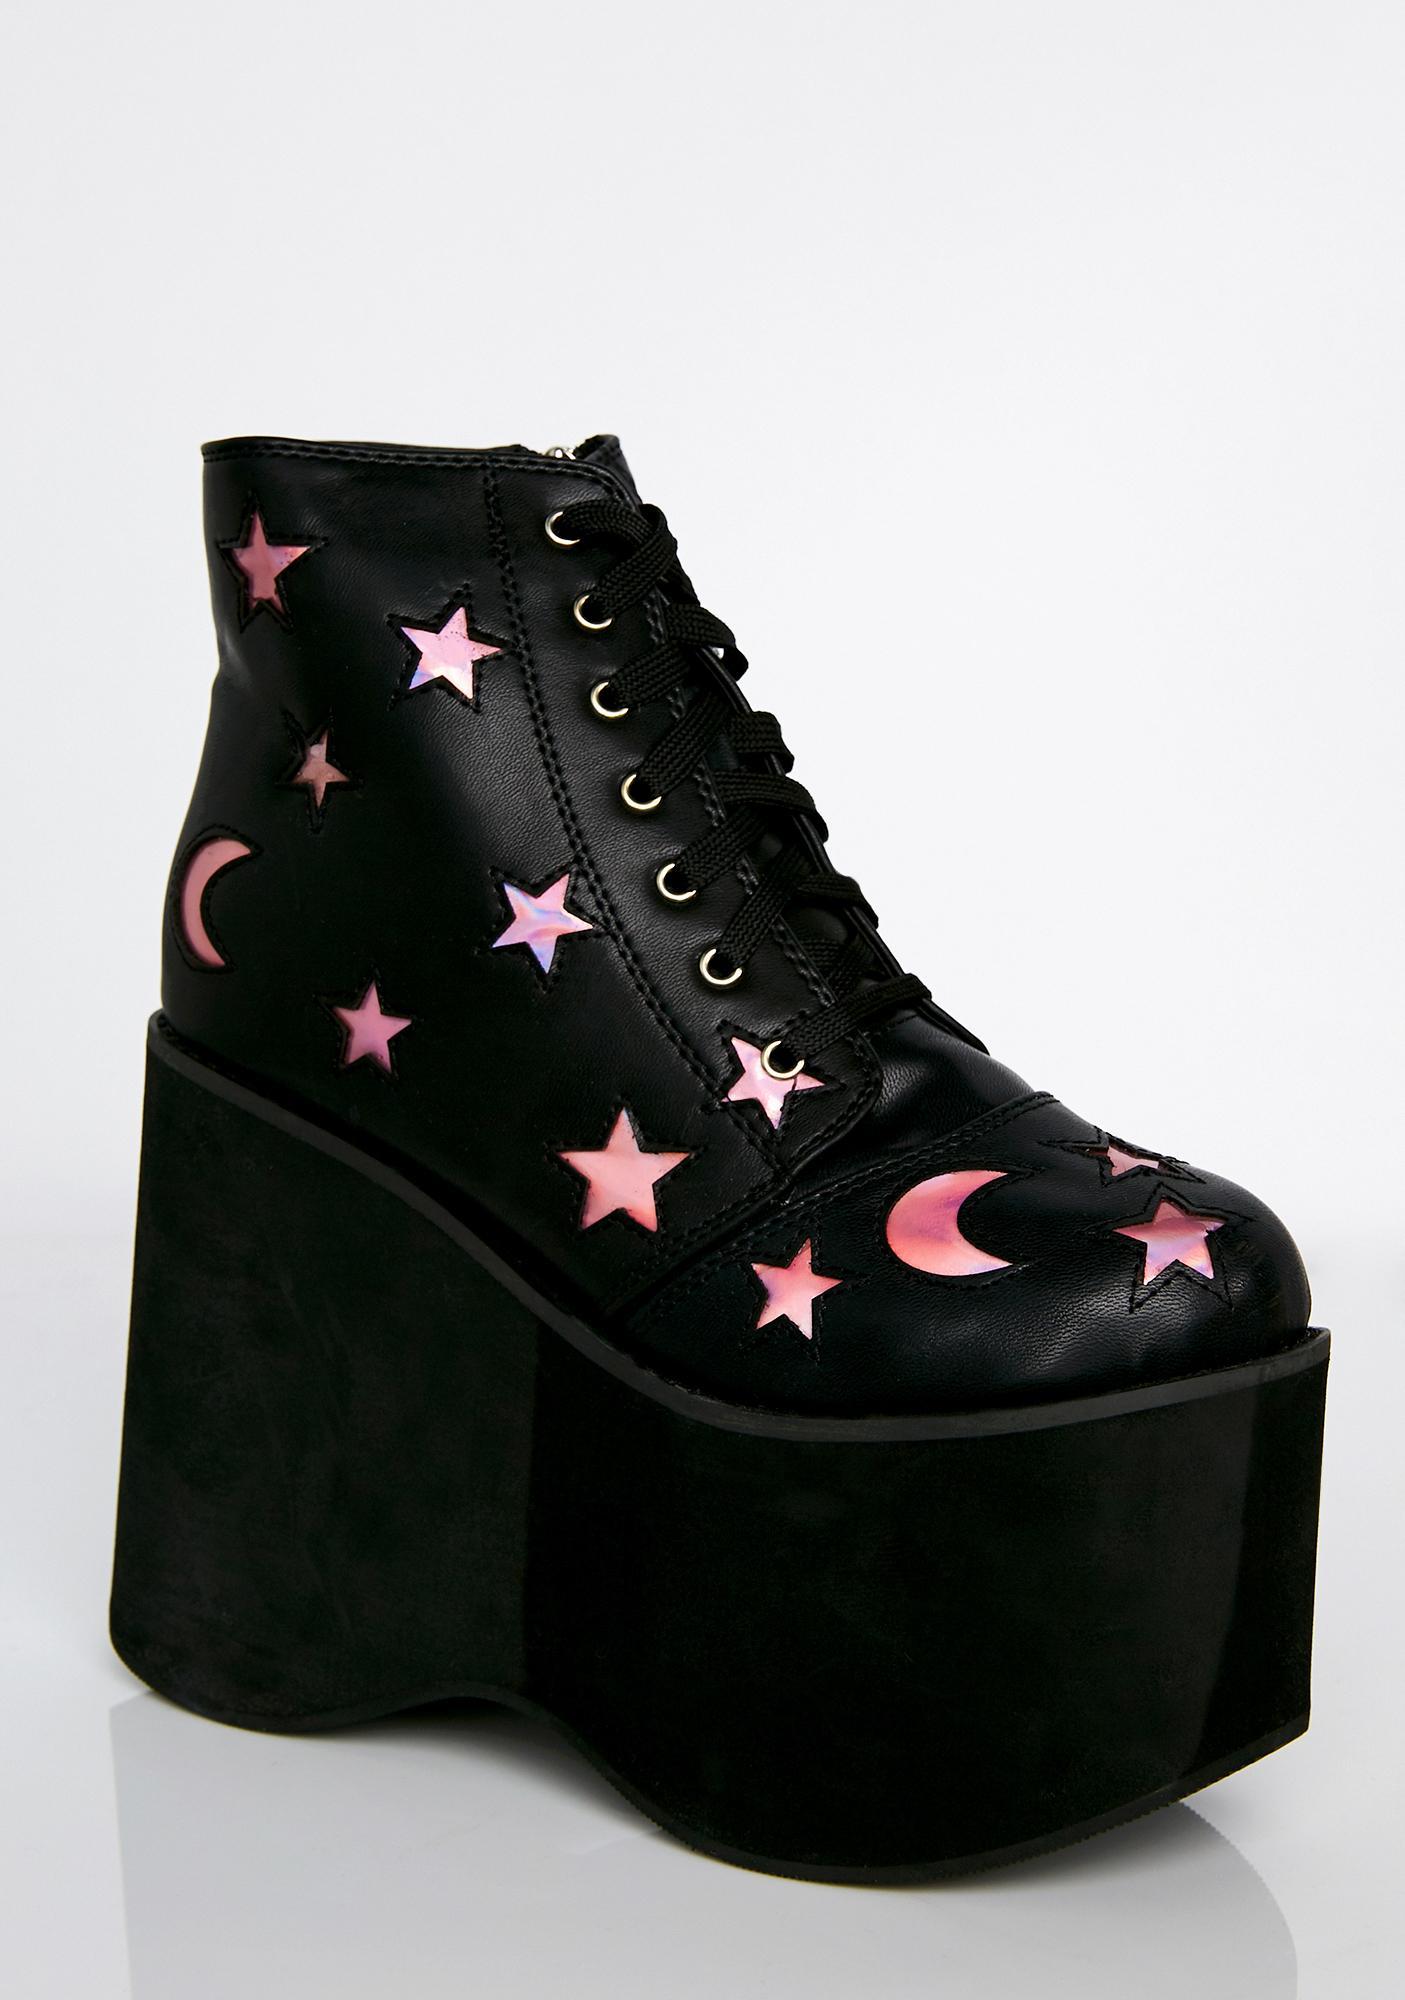 NightWalker Platform Boots